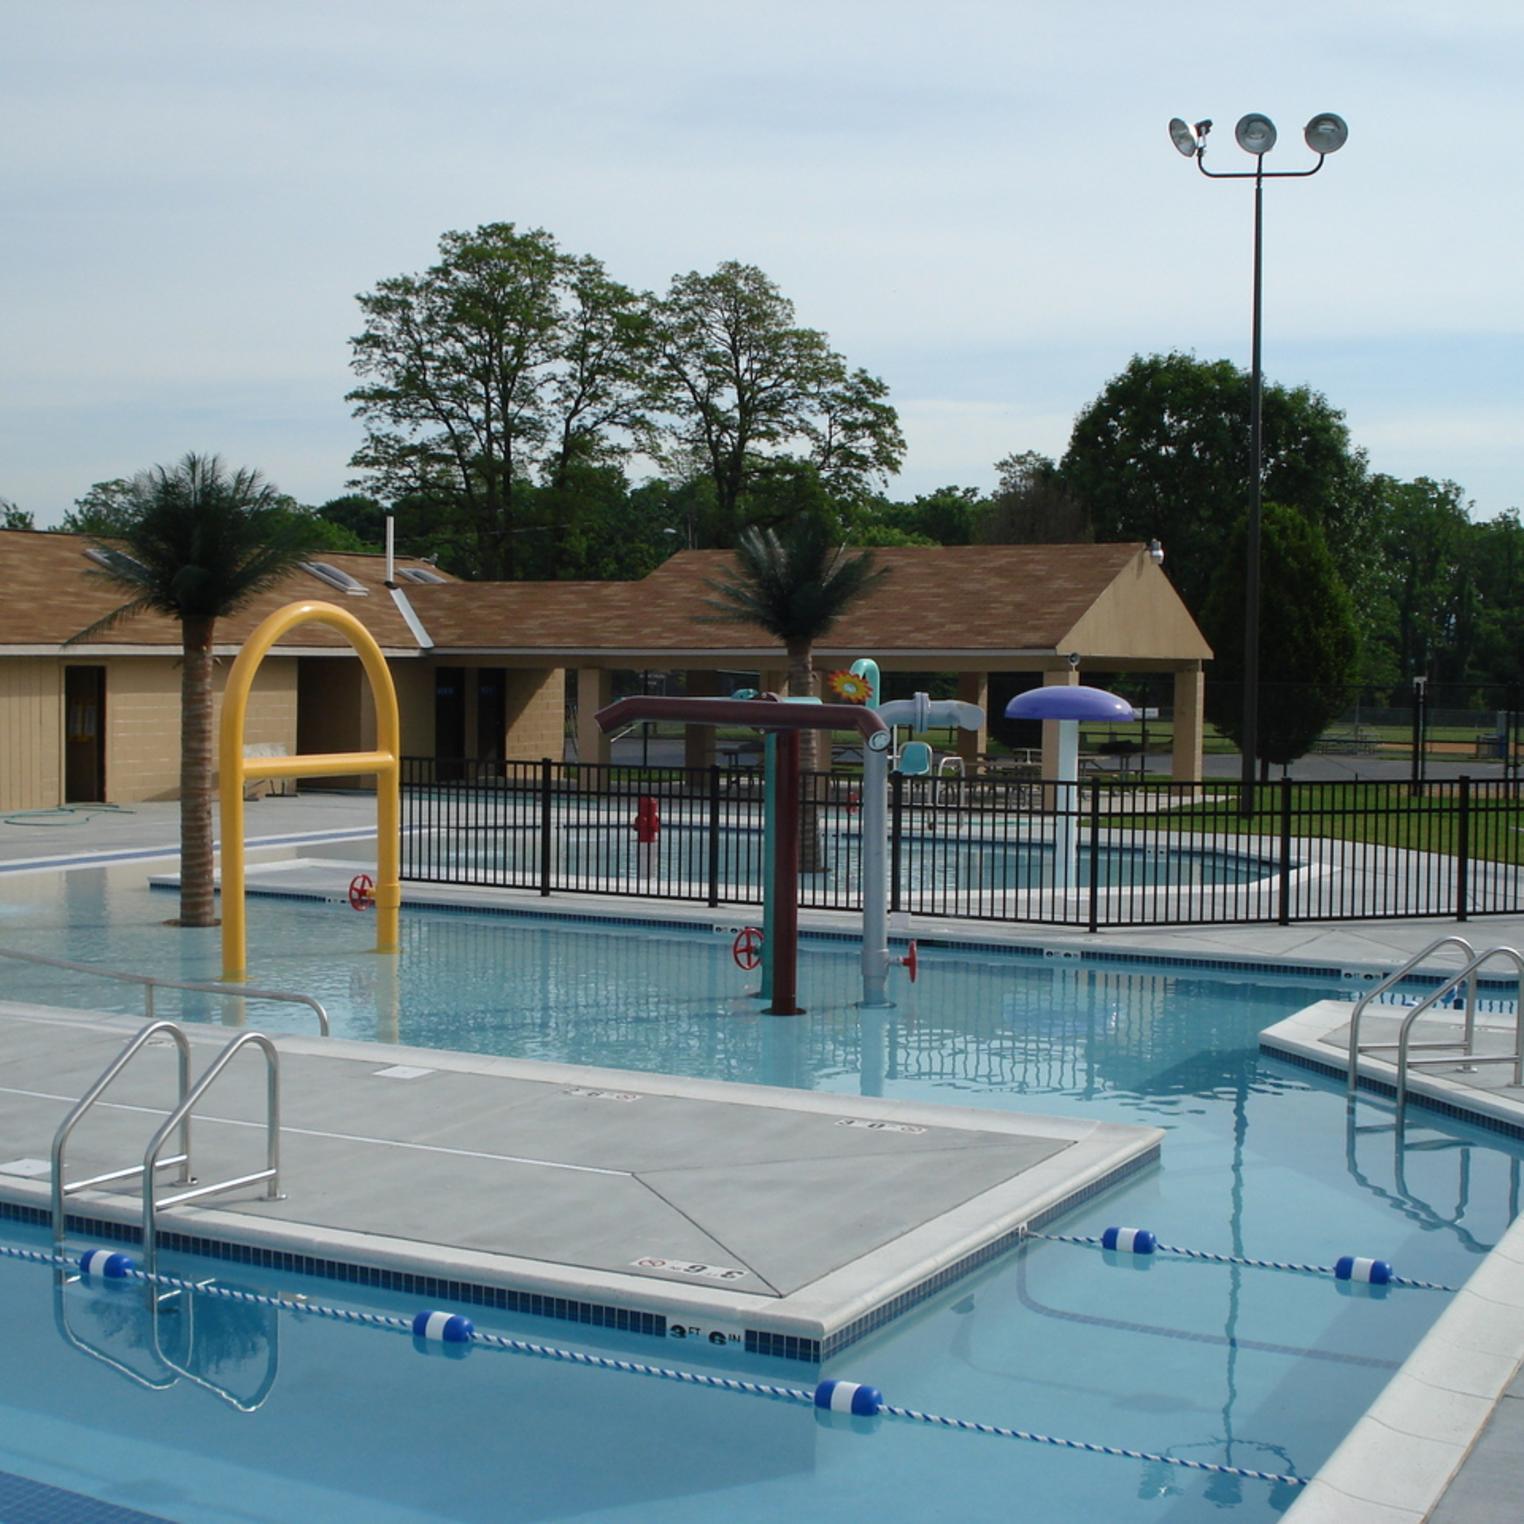 Lemoyne Community Swimming Pool